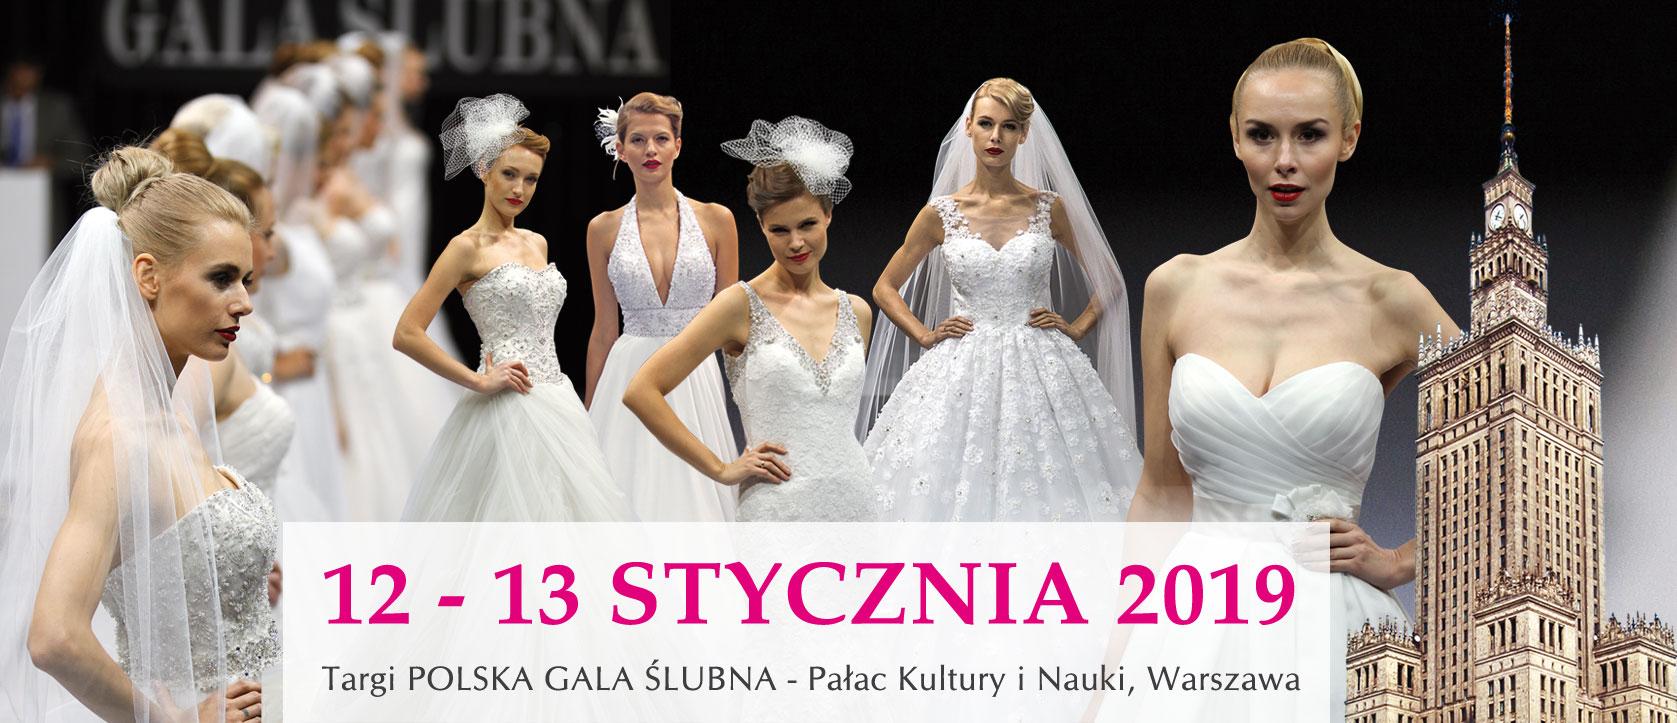 Targi Polska Gala Ślubna PKiN Warszawa